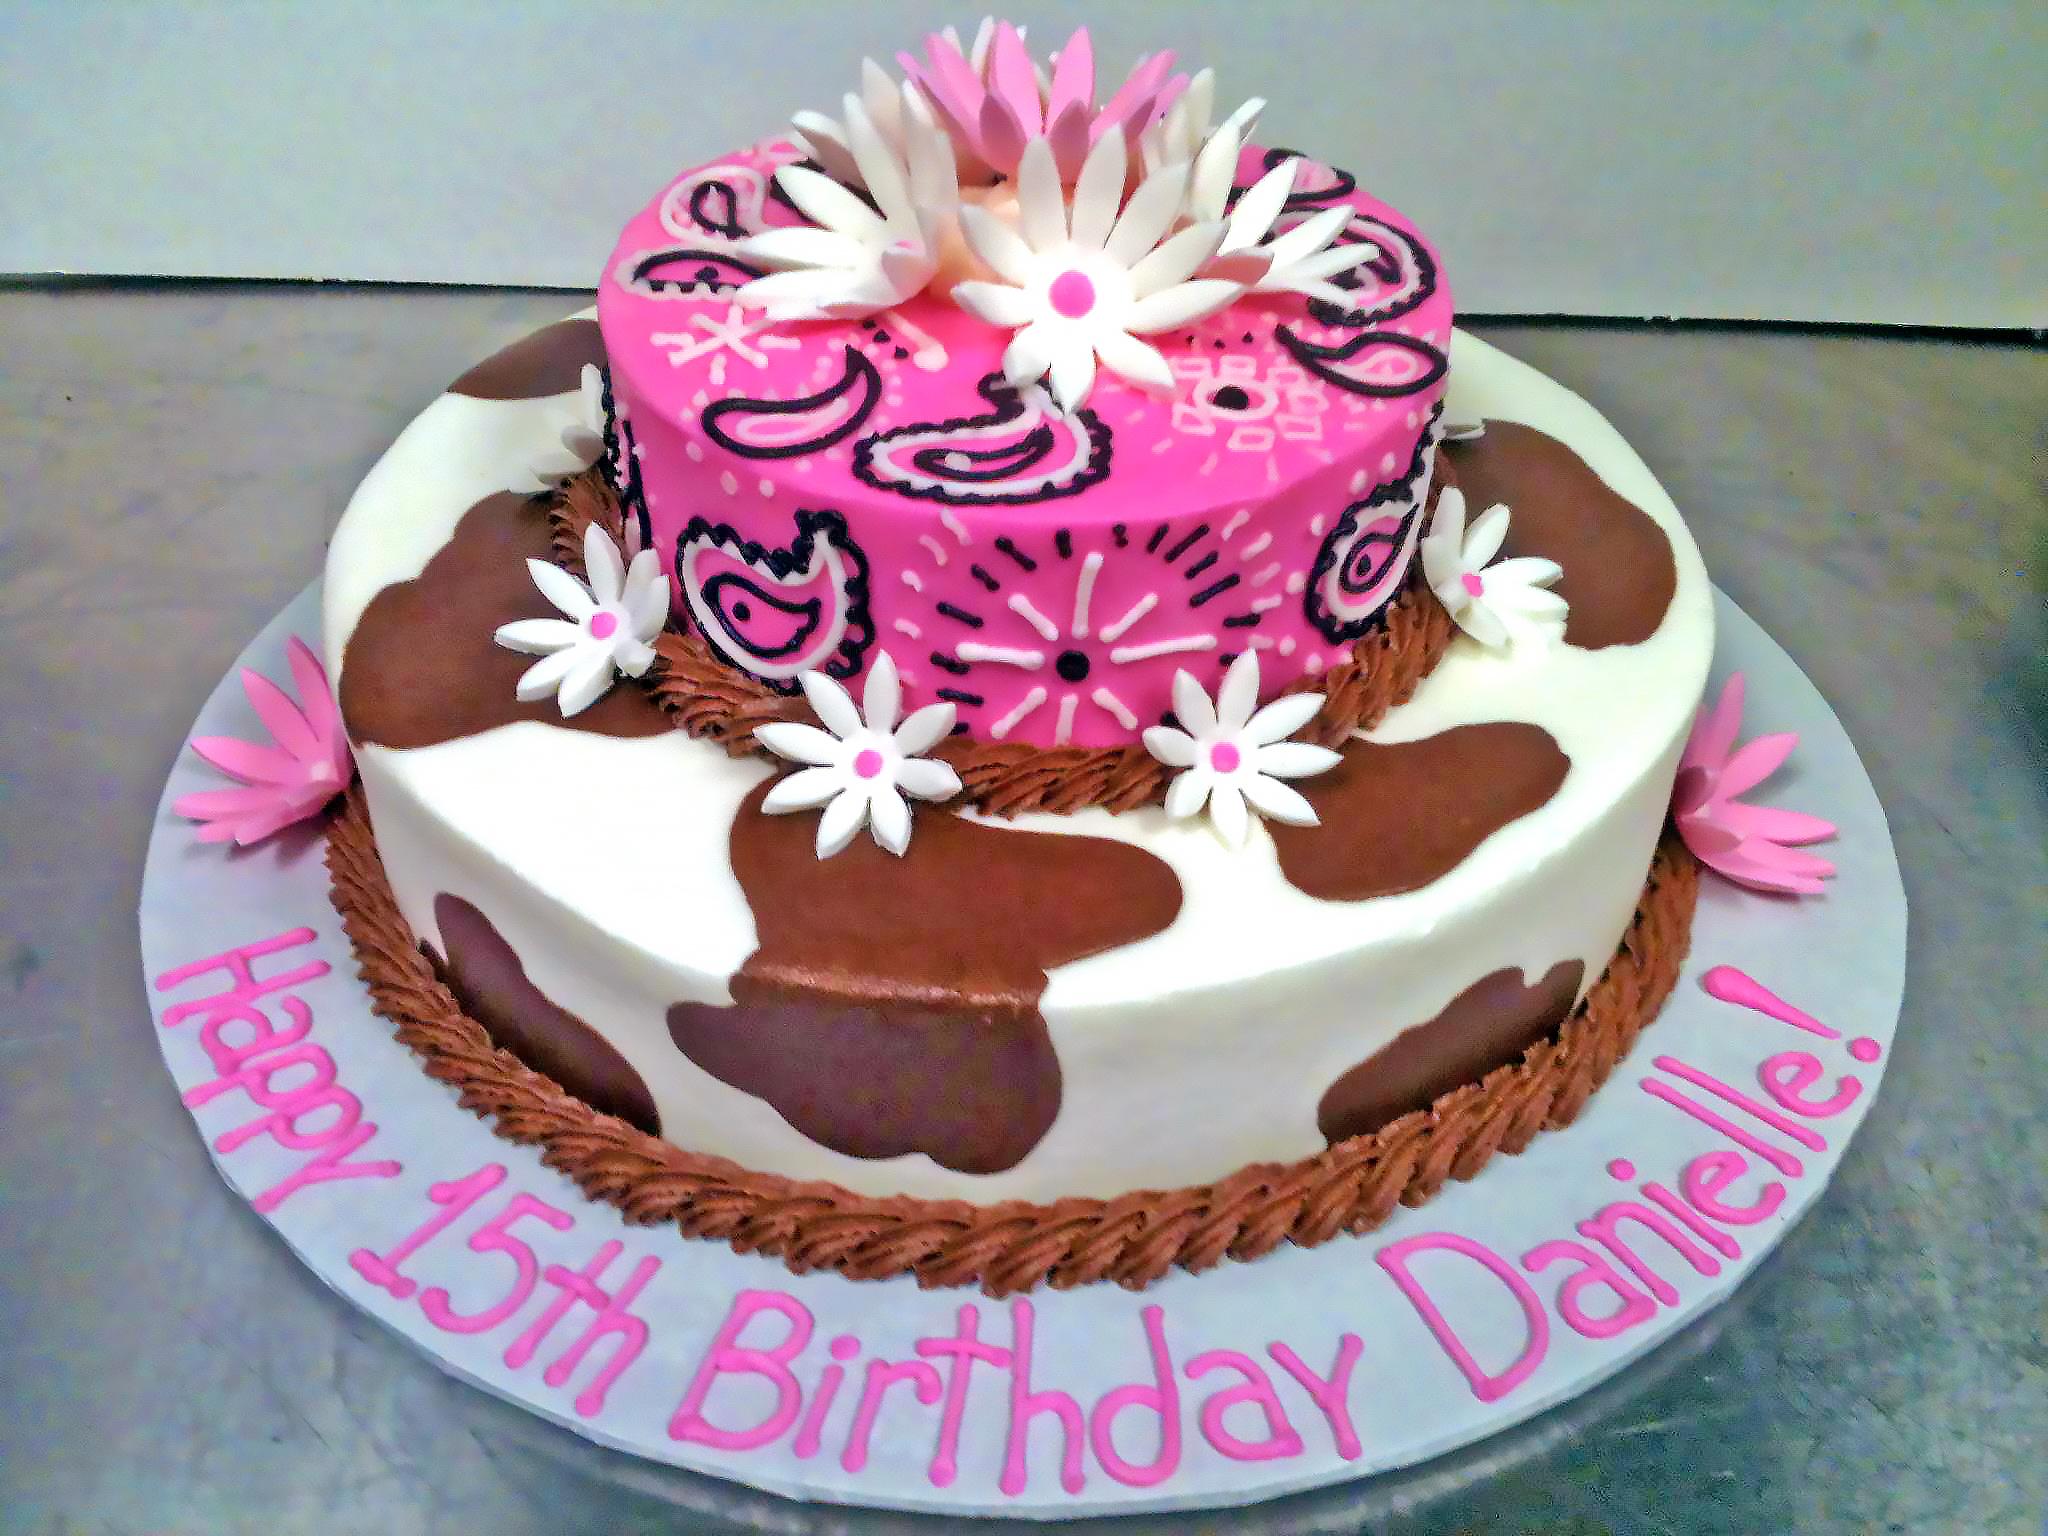 2tier-birthday-cake-cowgirl-flowers-girls-775